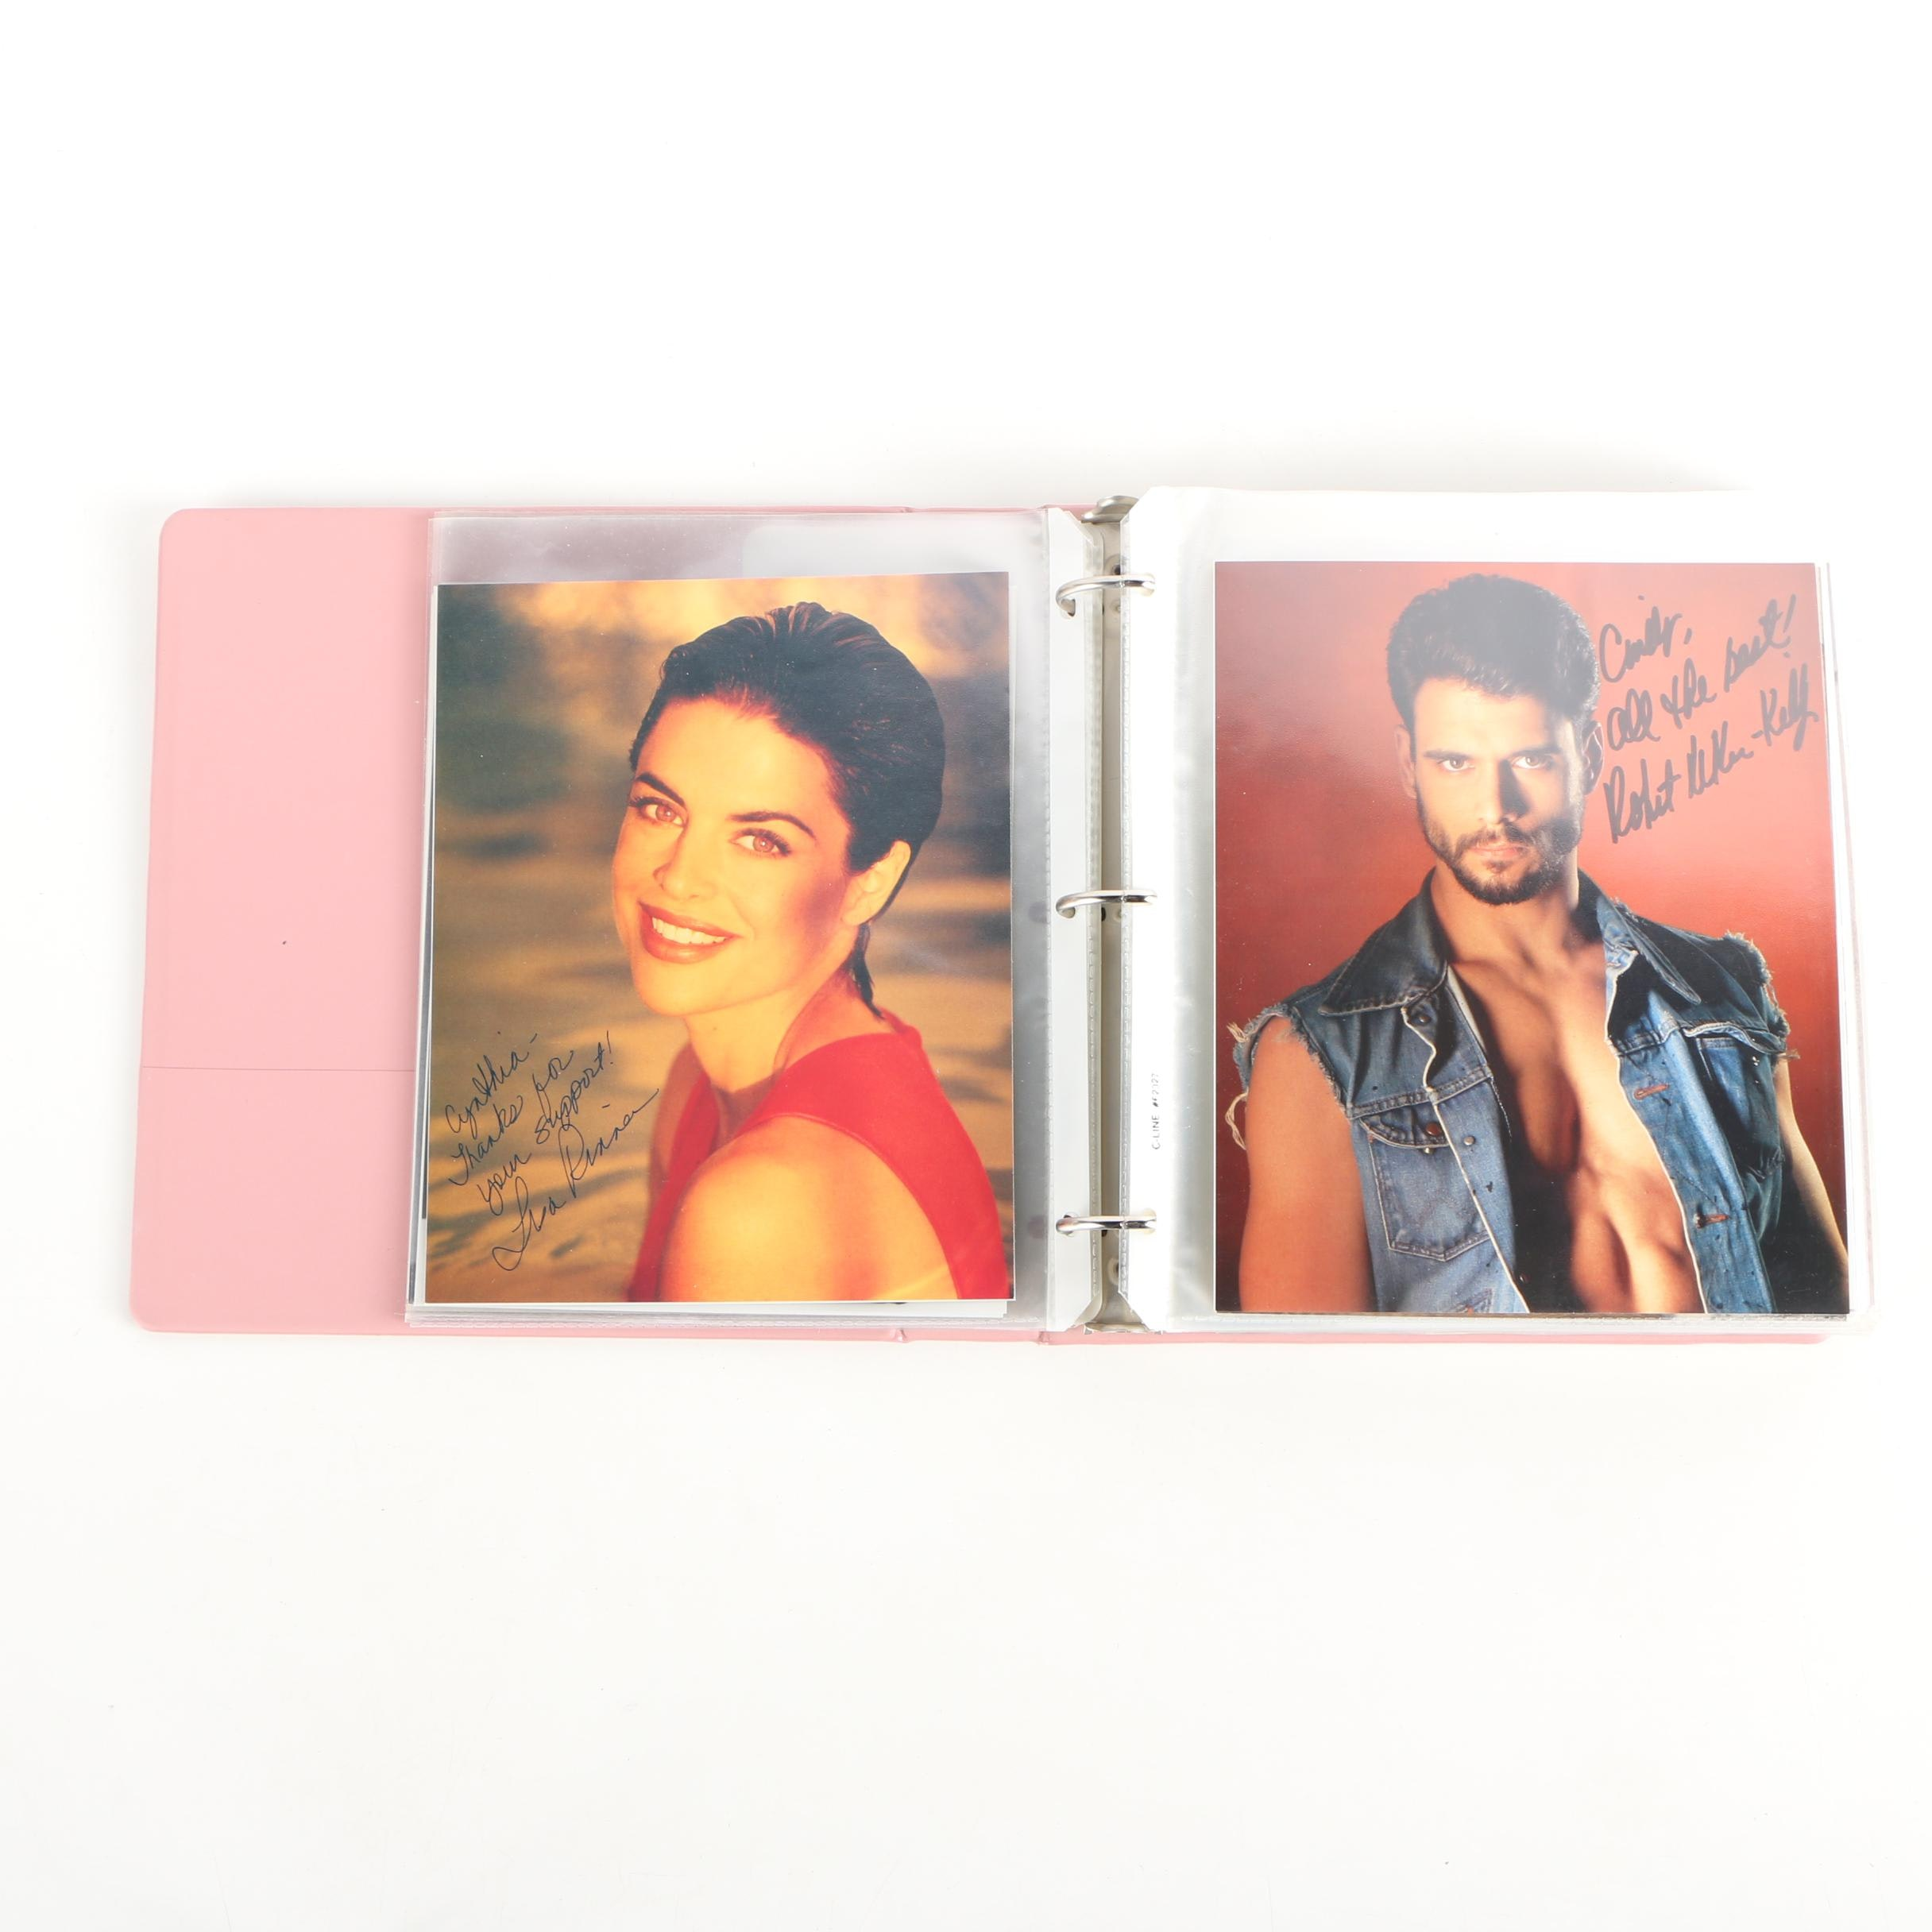 Autograph Album of Soap Opera Stars